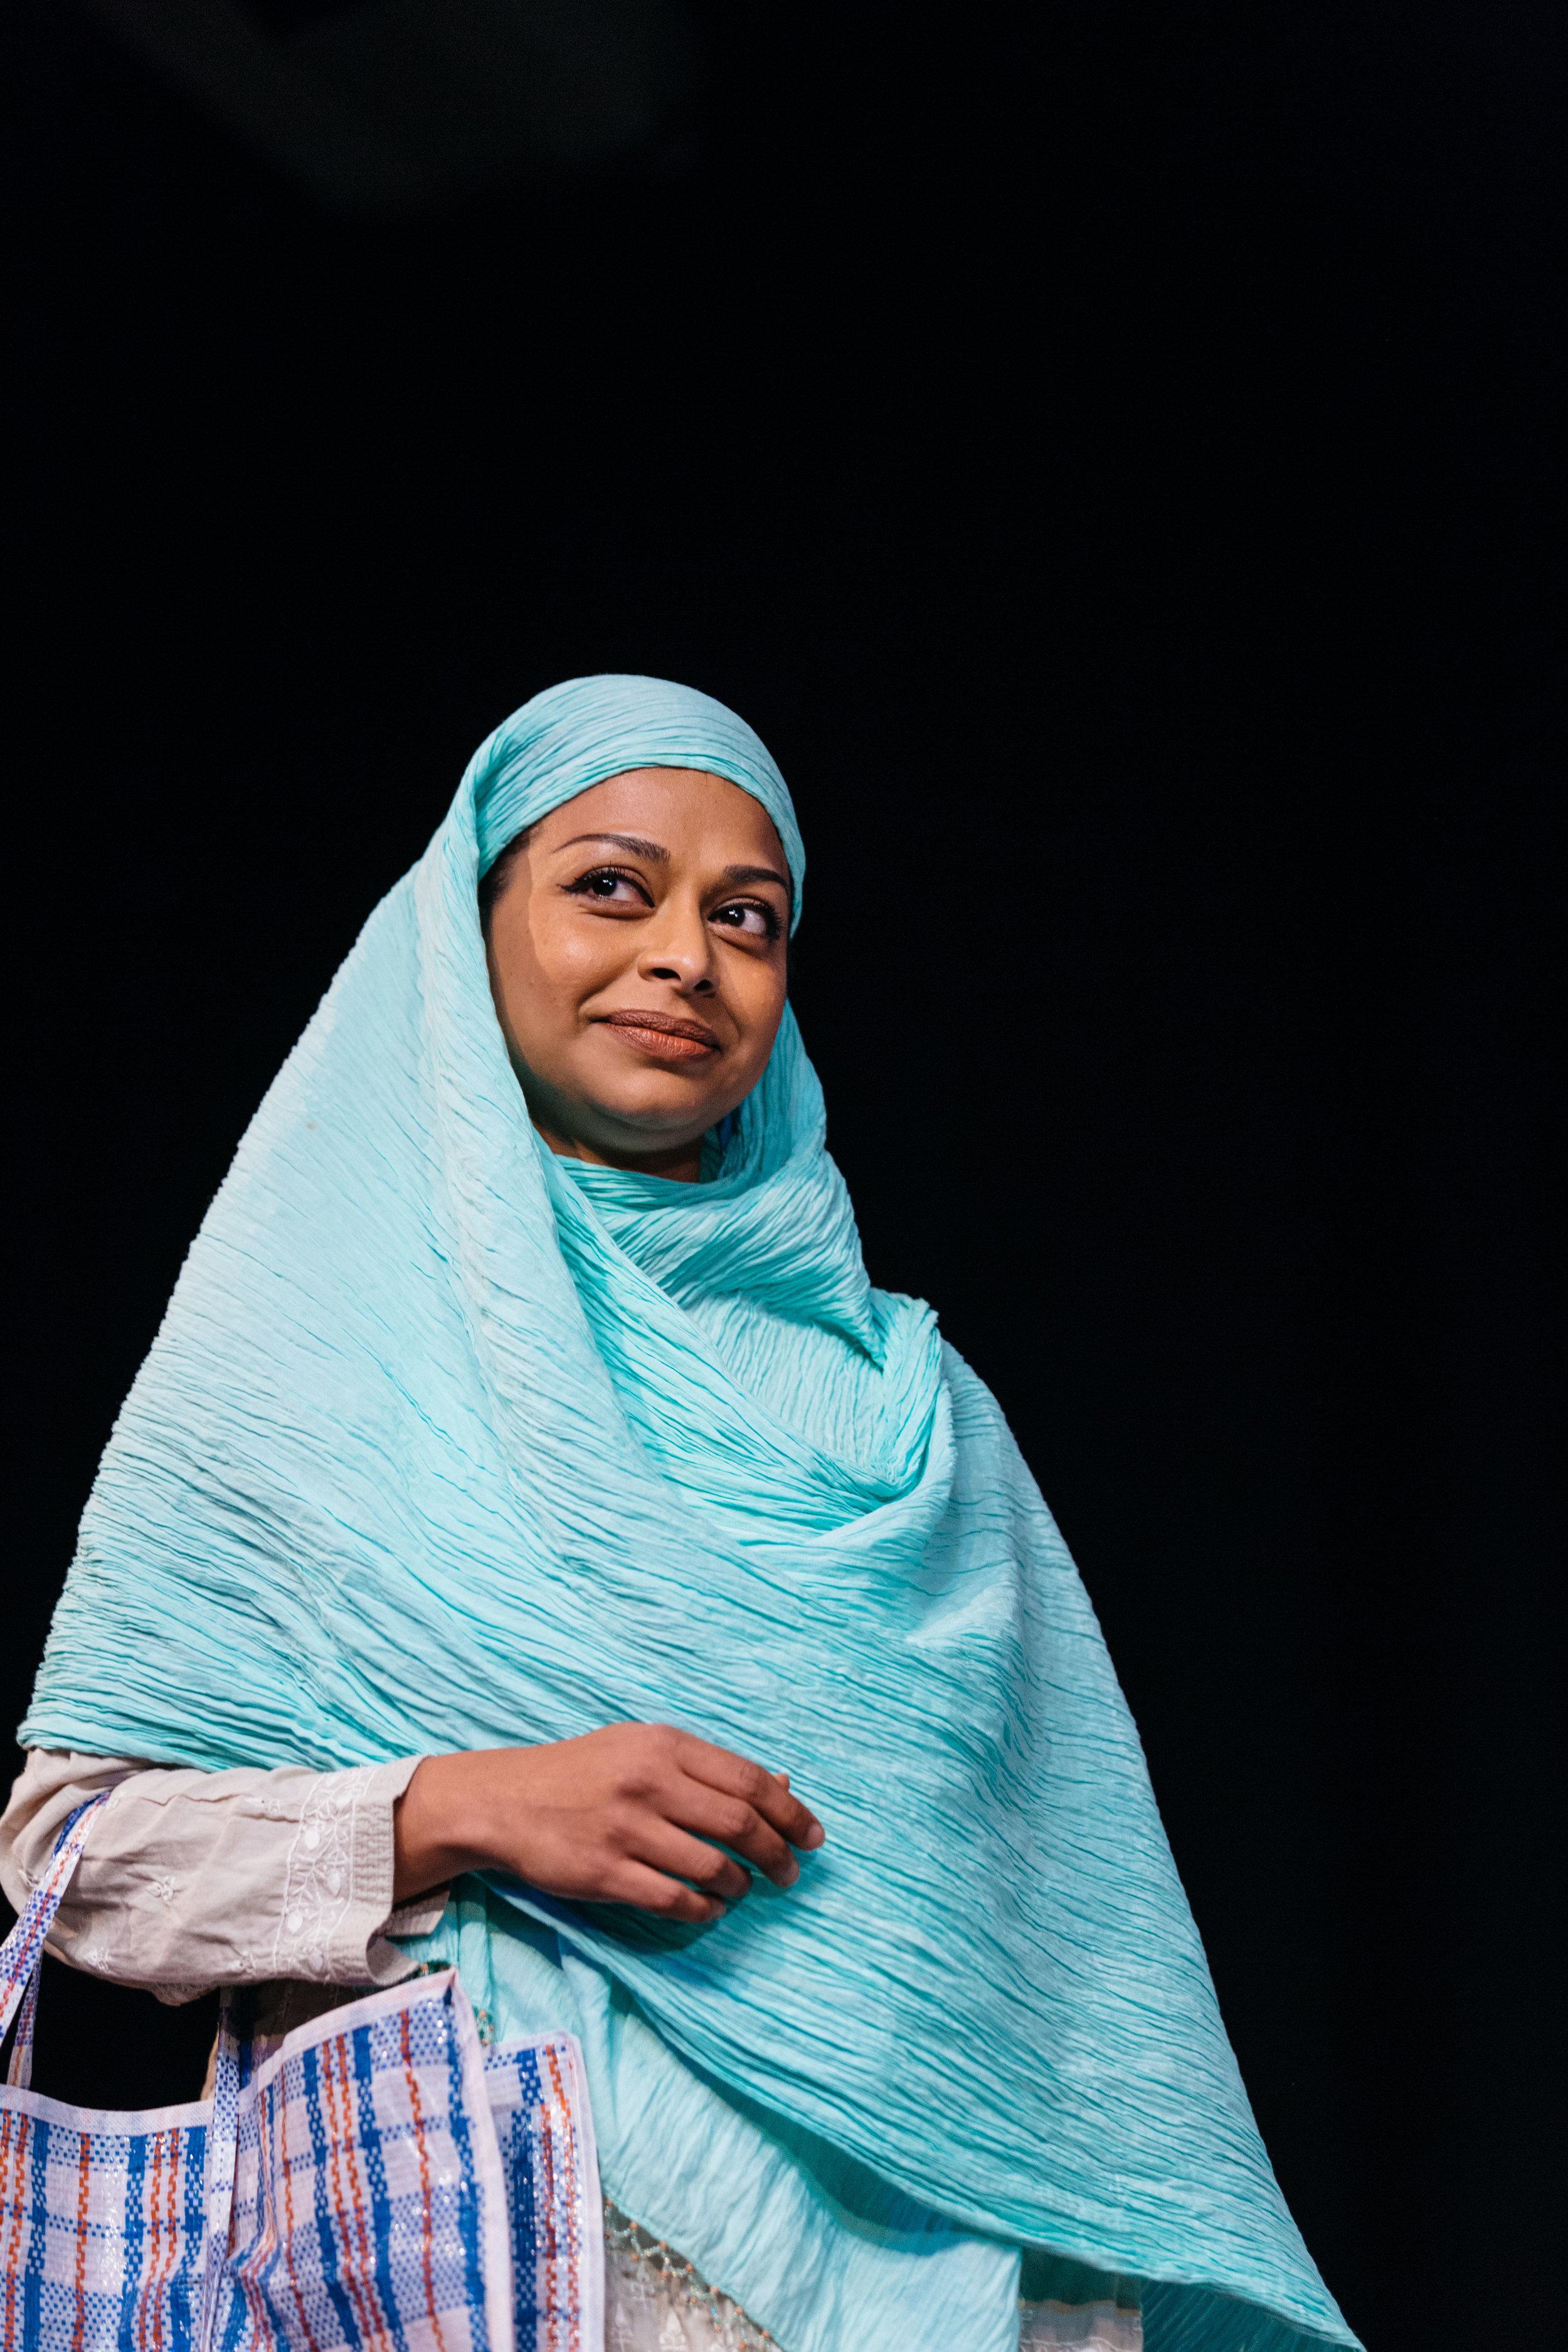 Ayesha Darker in Hijabi Monologues London directed by Milli Bhatia-742 ©helenmurray.jpg